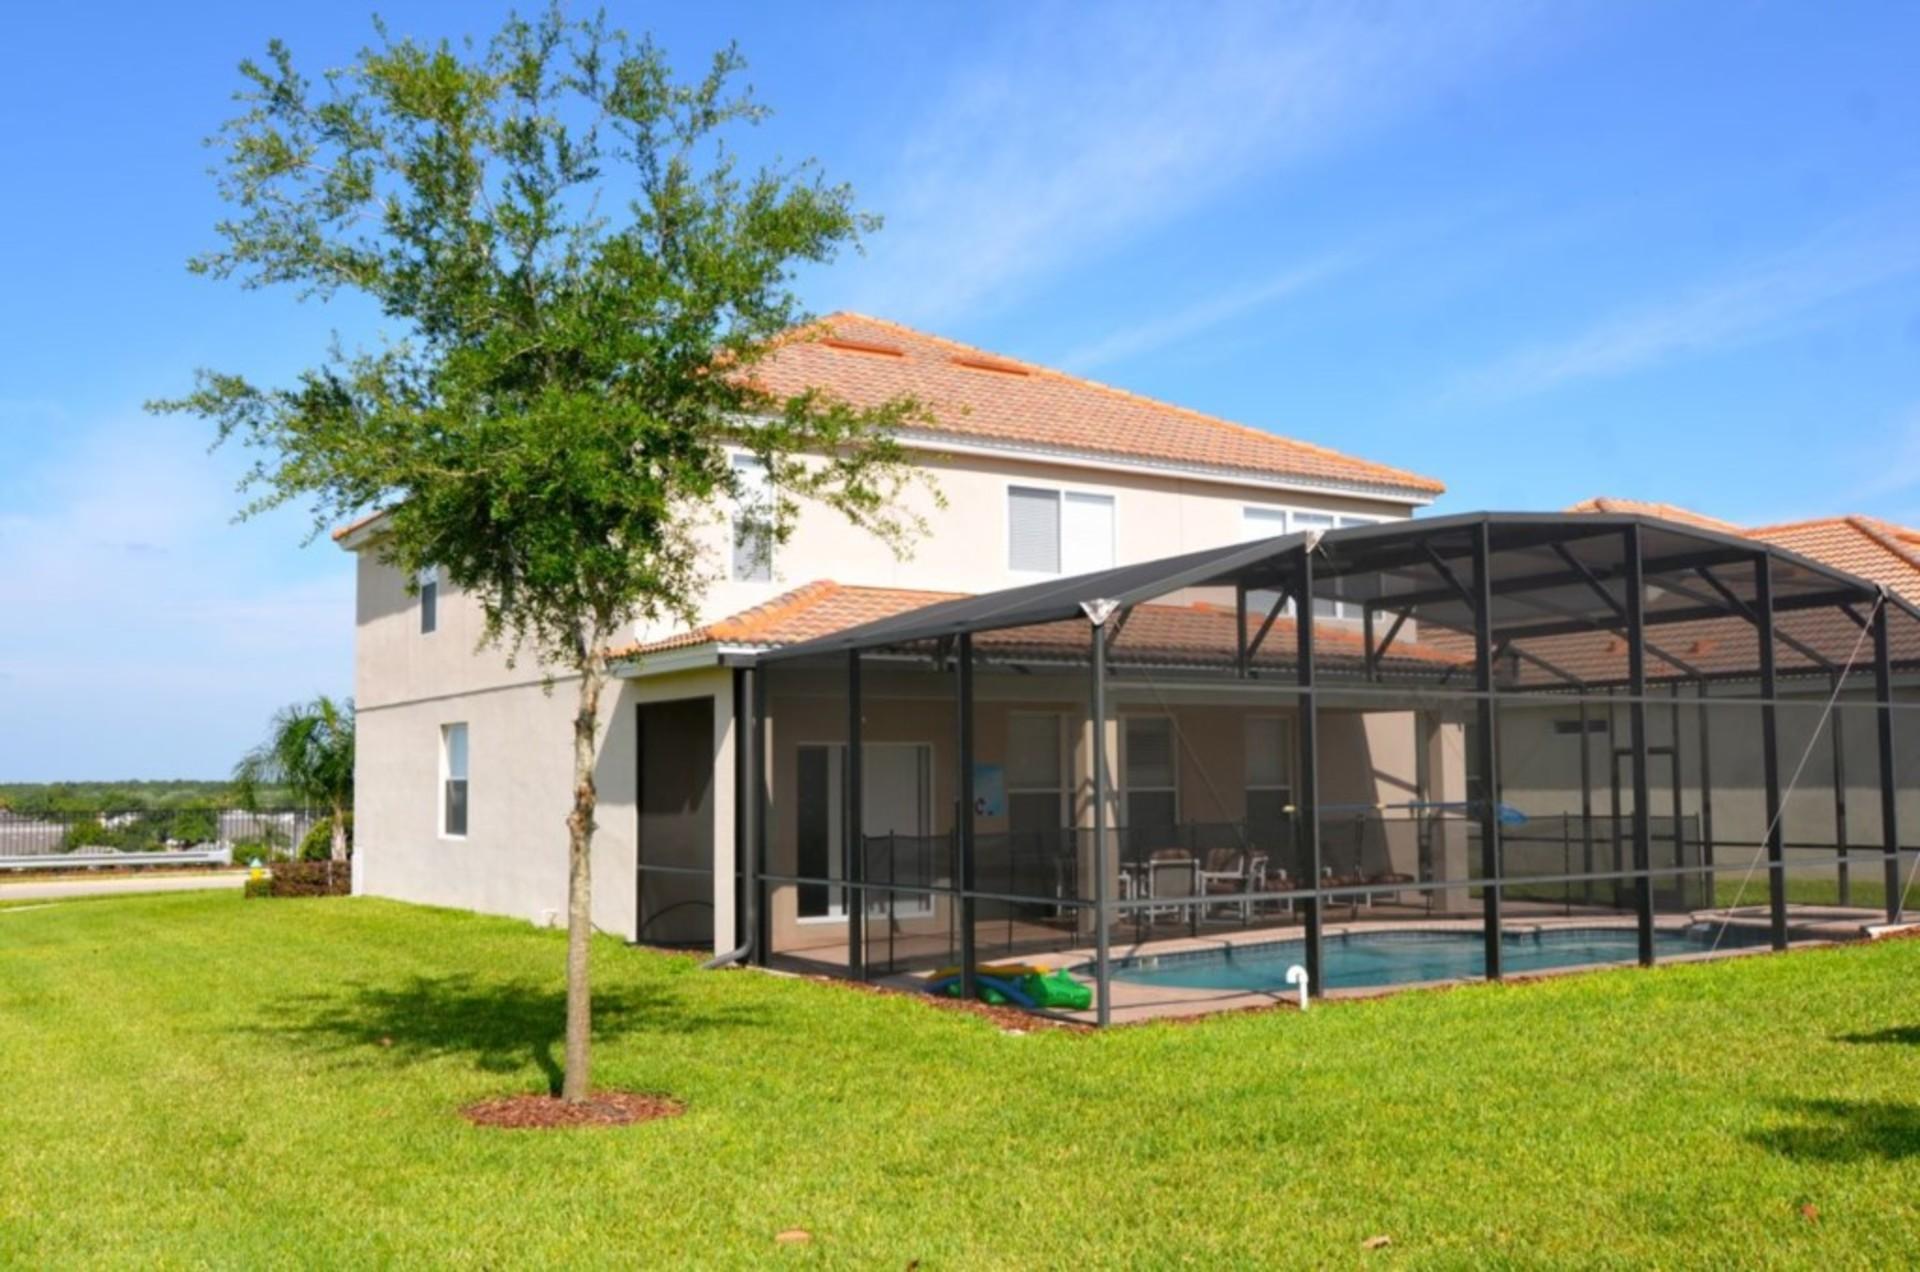 Enjoy a 5 Star Villa Holiday with your Family, Windsor Hills Resort, Villa Orlando 1459 photo 5803817